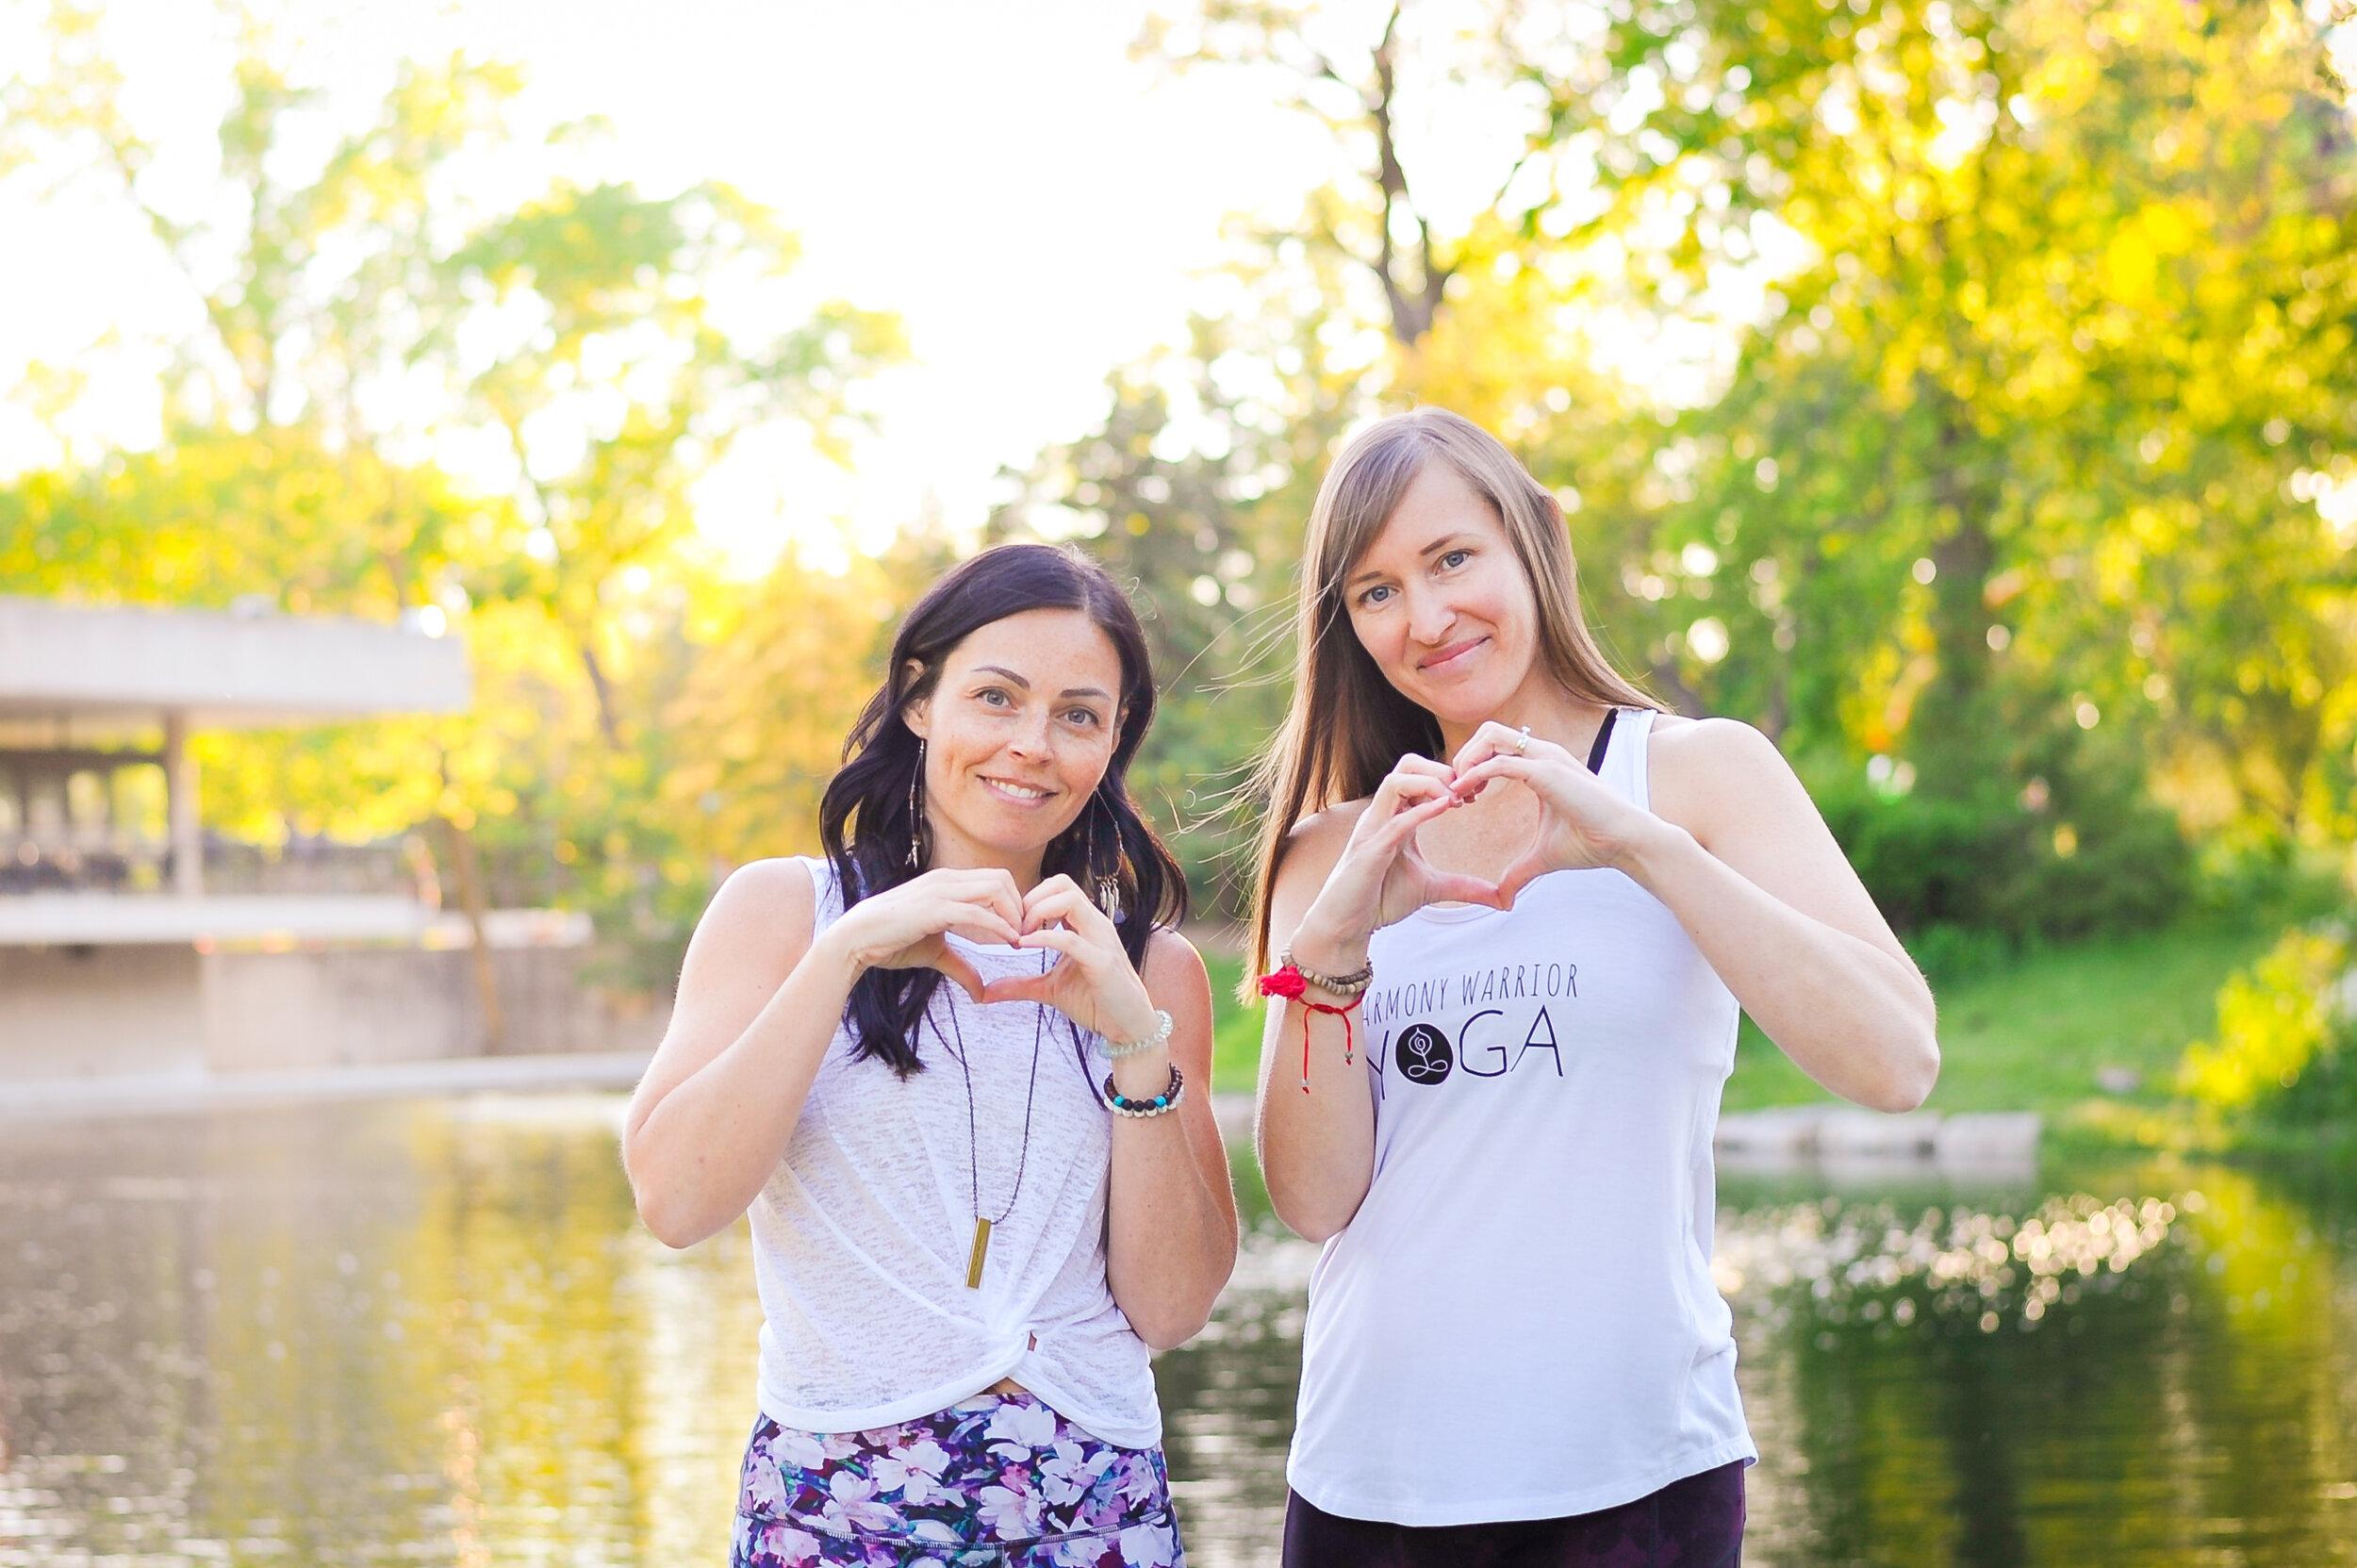 Kim Dorge (left) and Jen Breckman (right), Harmony Warrior Yoga Co-founders.